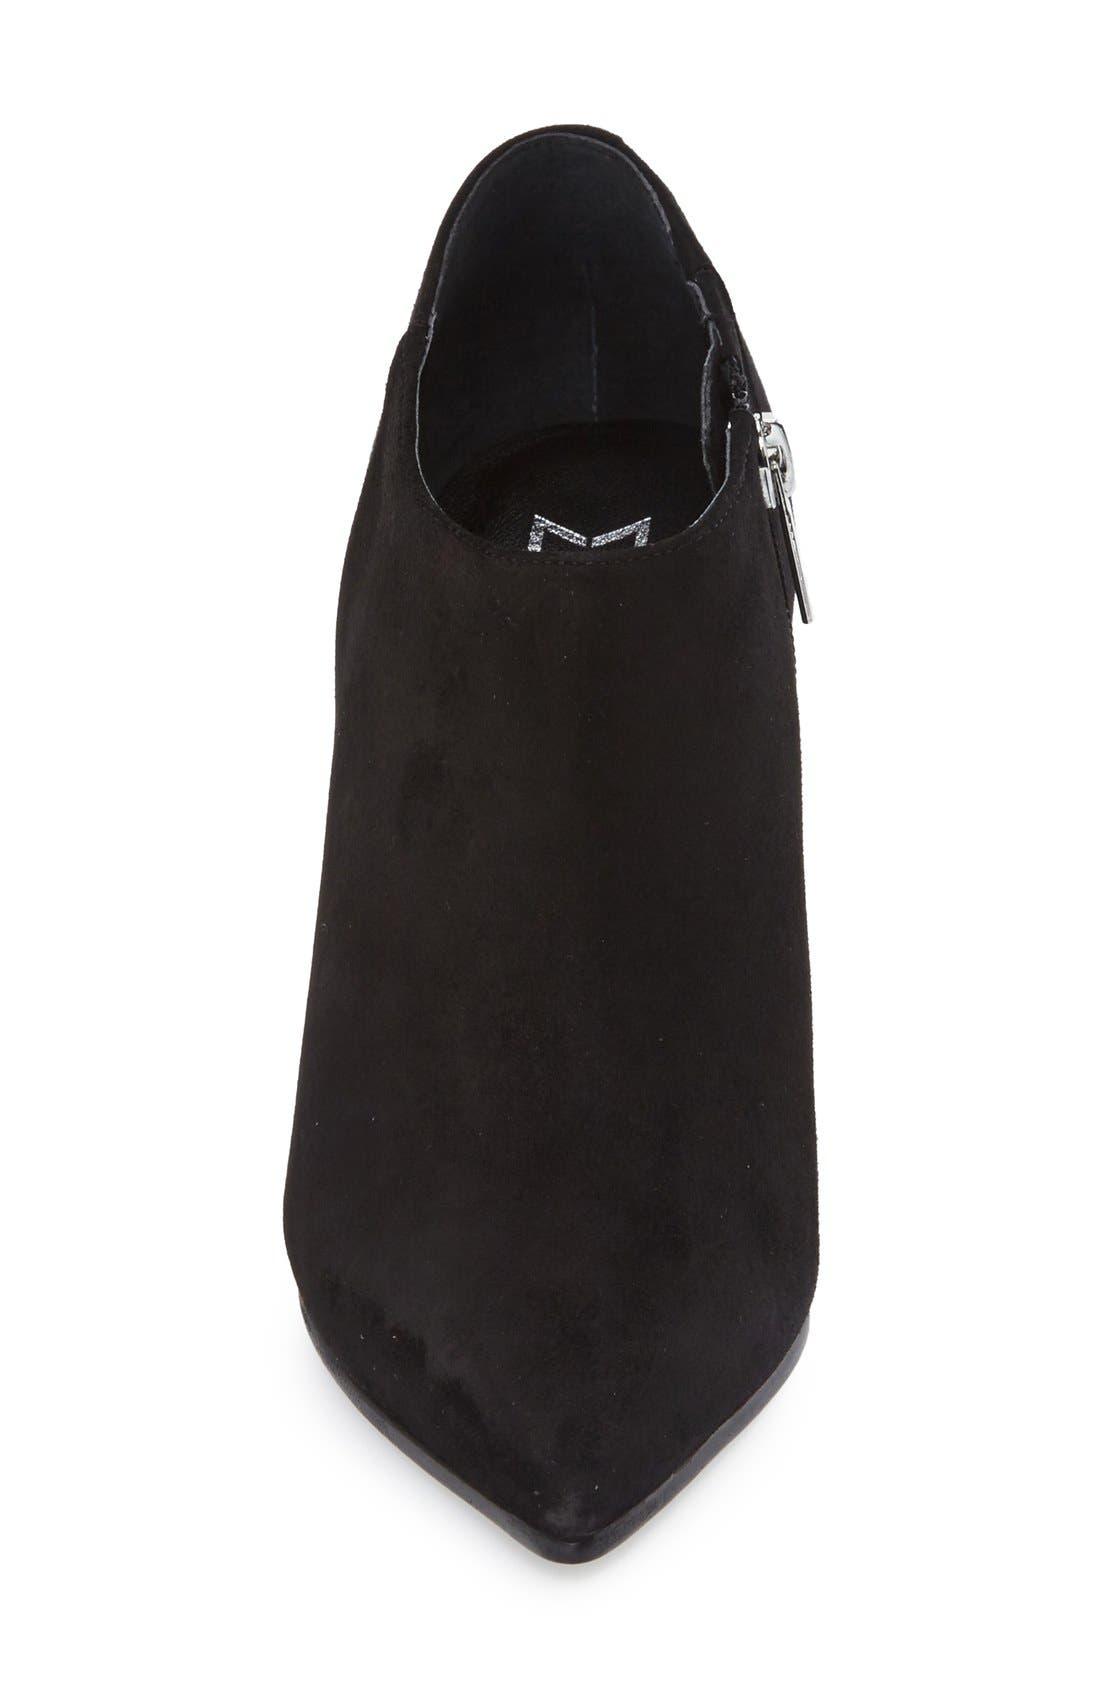 Alternate Image 3  - Marc Fisher LTD 'Jayla' Block Heel Bootie (Women)